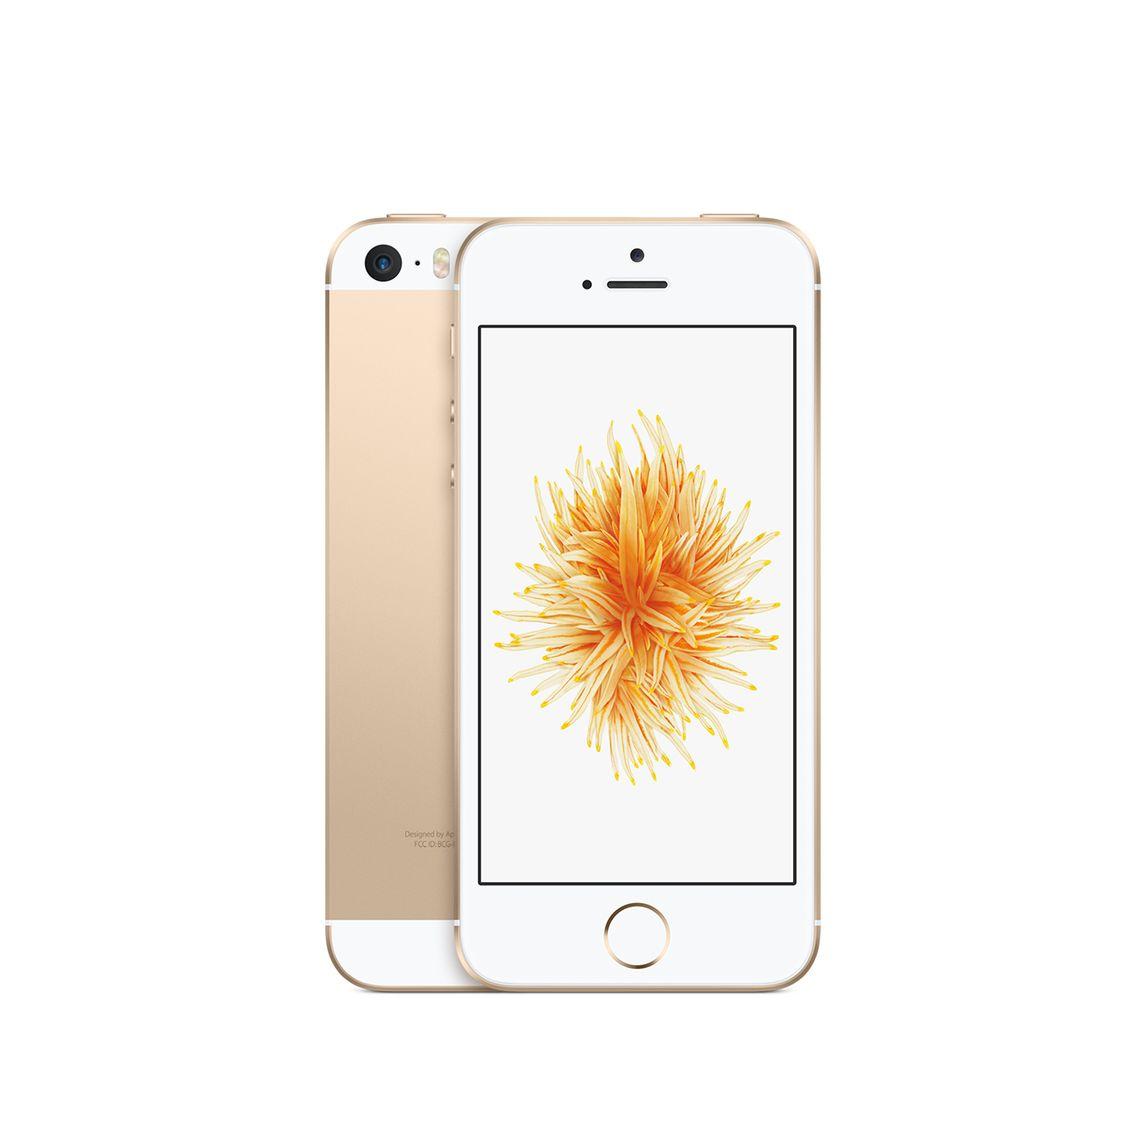 iPhone SE 32GB - Gold (Unlocked)